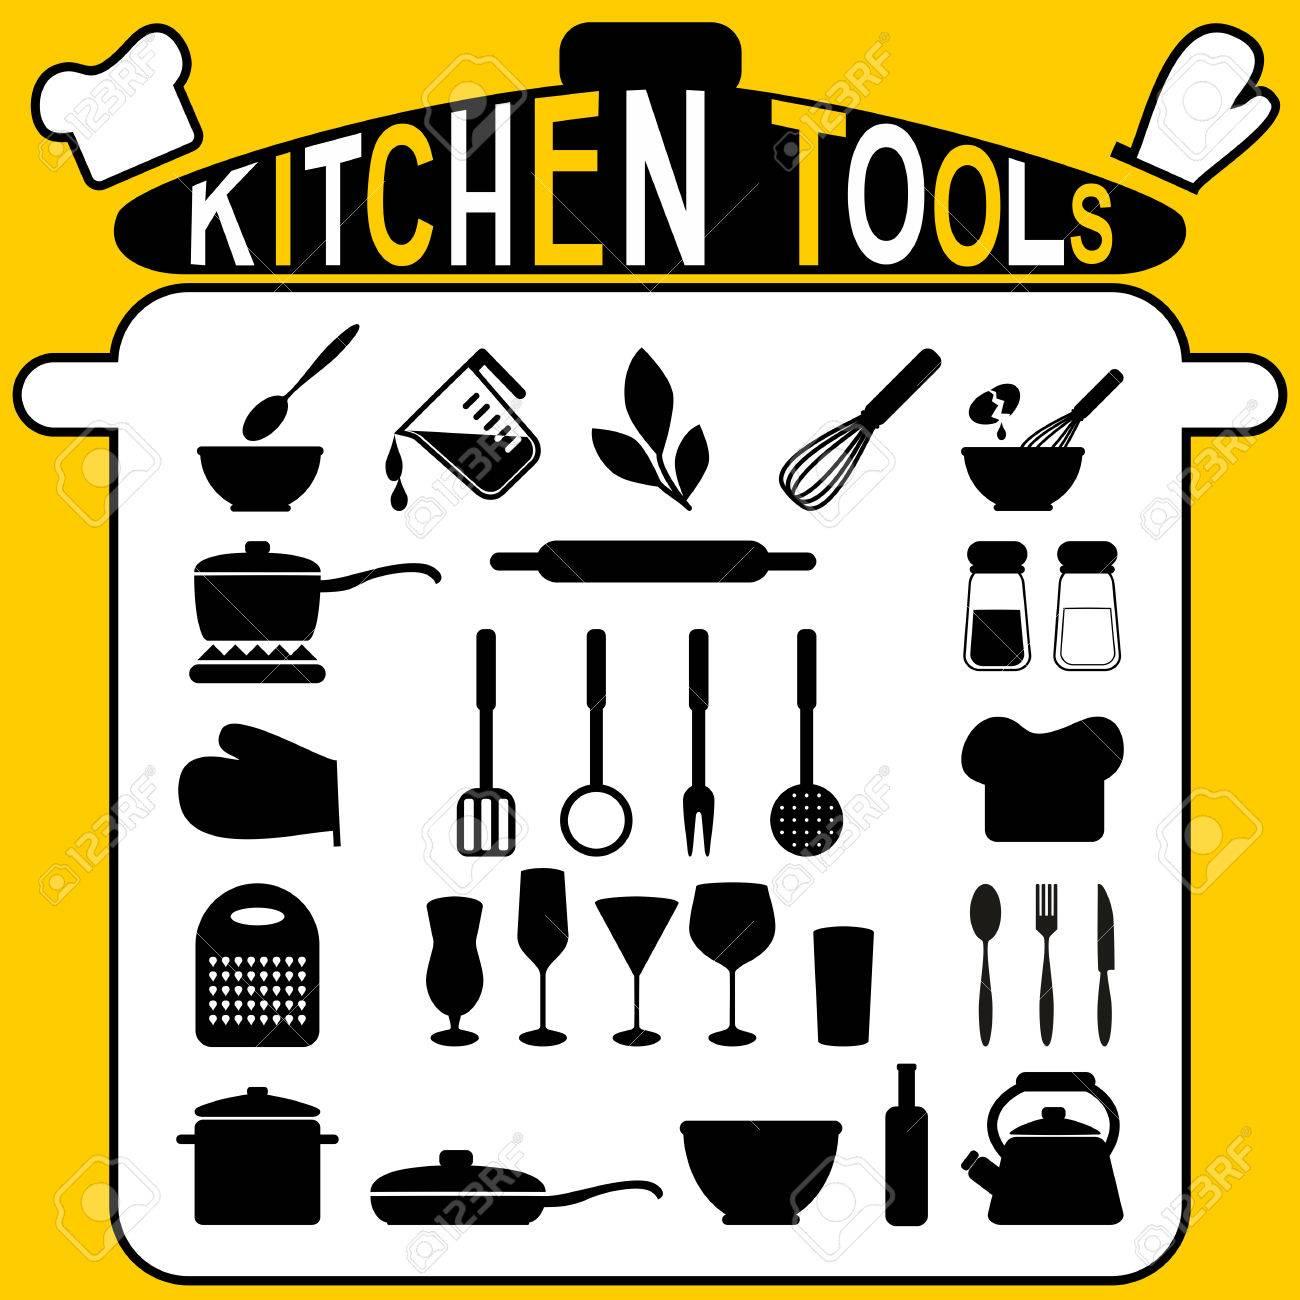 Kitchen tools - icons set - 22627068